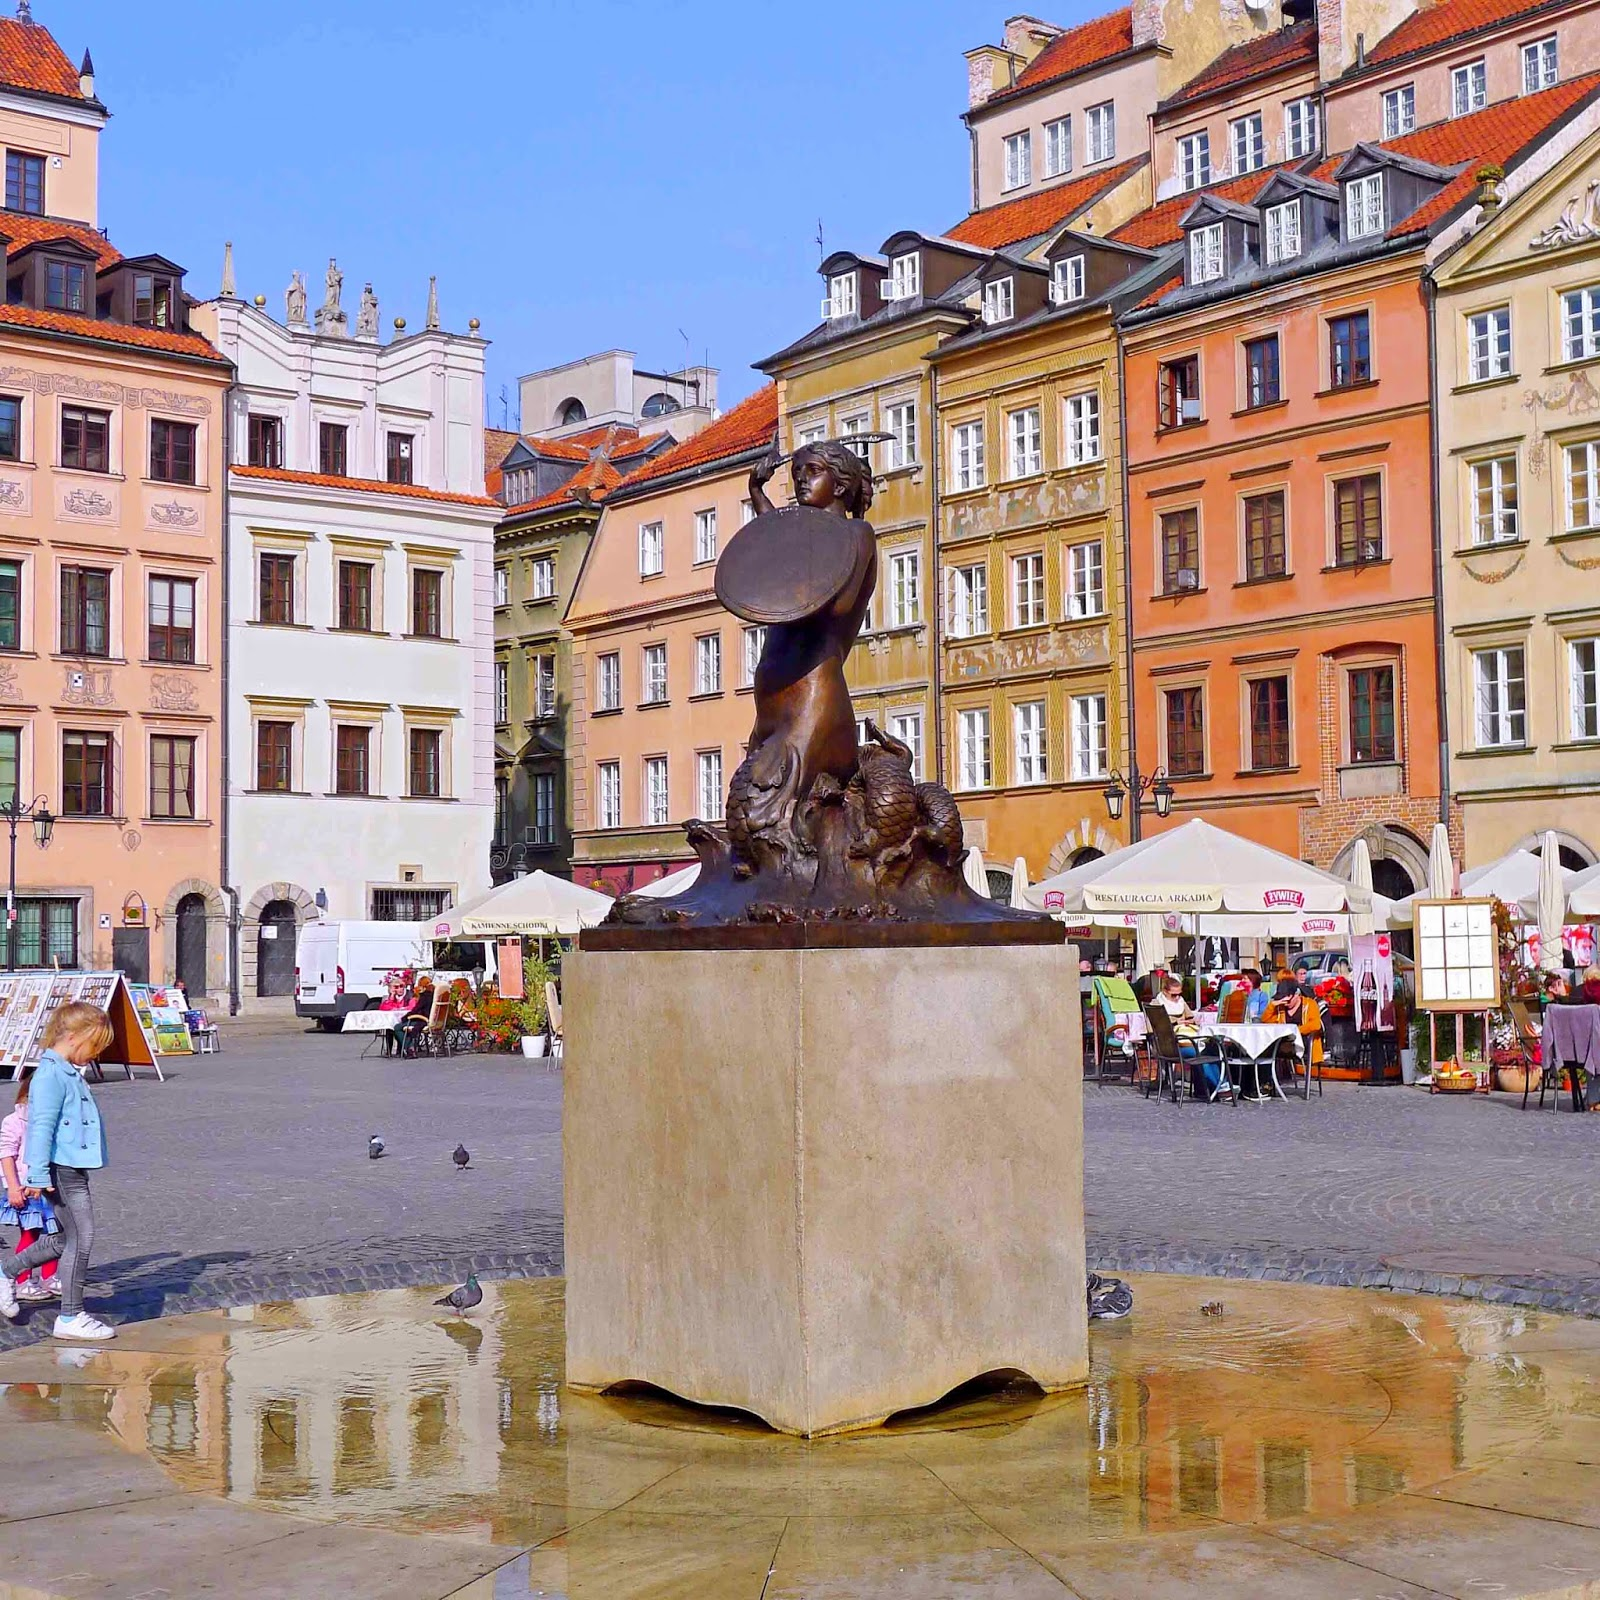 Warsaw Mermaid (Syrenka)